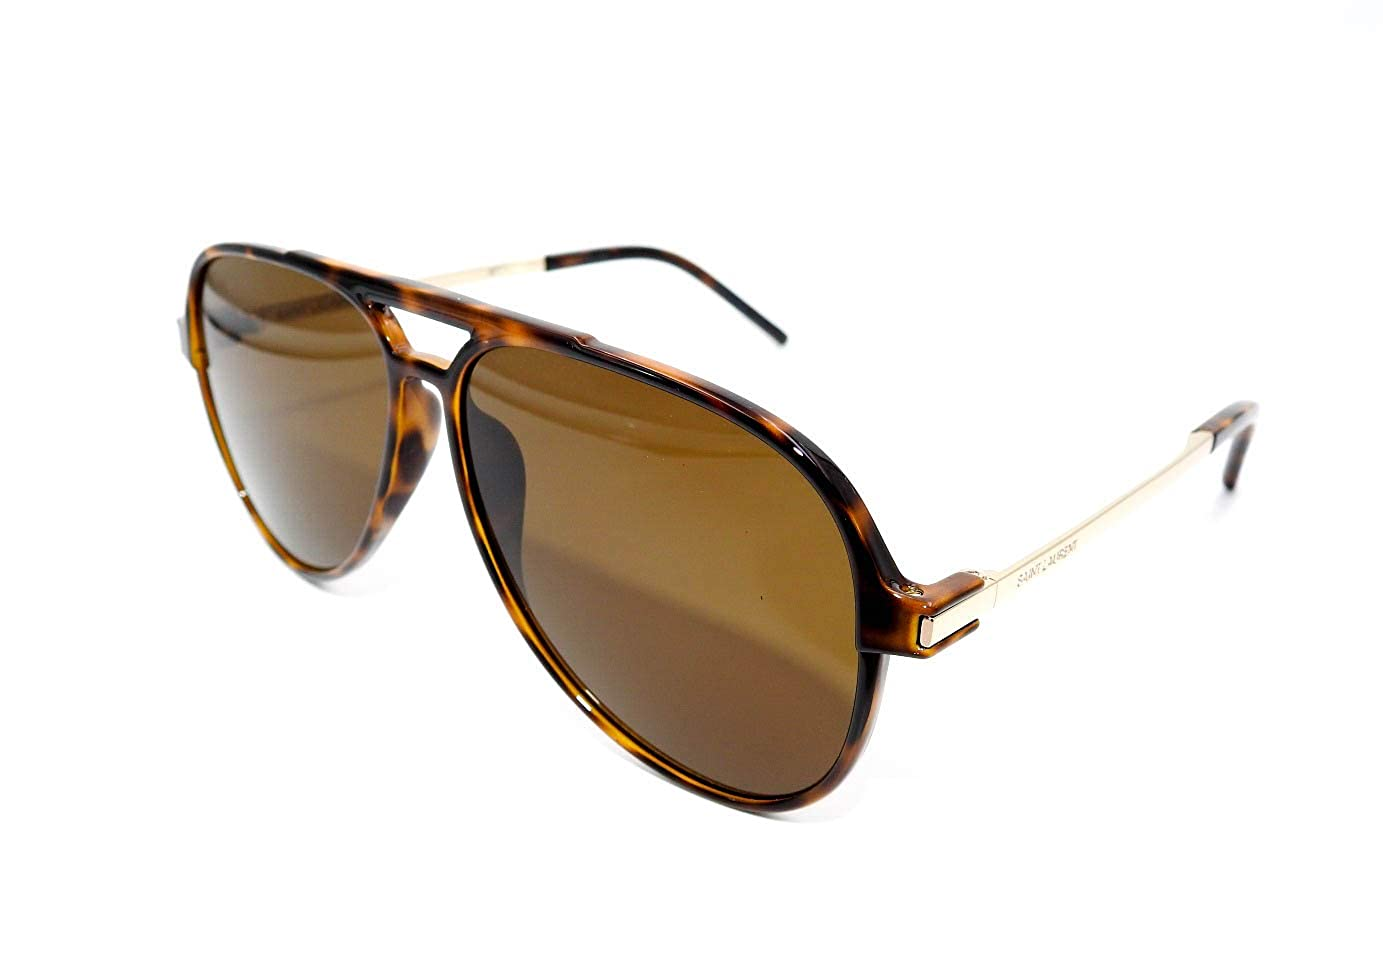 Amazon.com: Yves Saint Laurent sunglasses (SL-228 003 ...